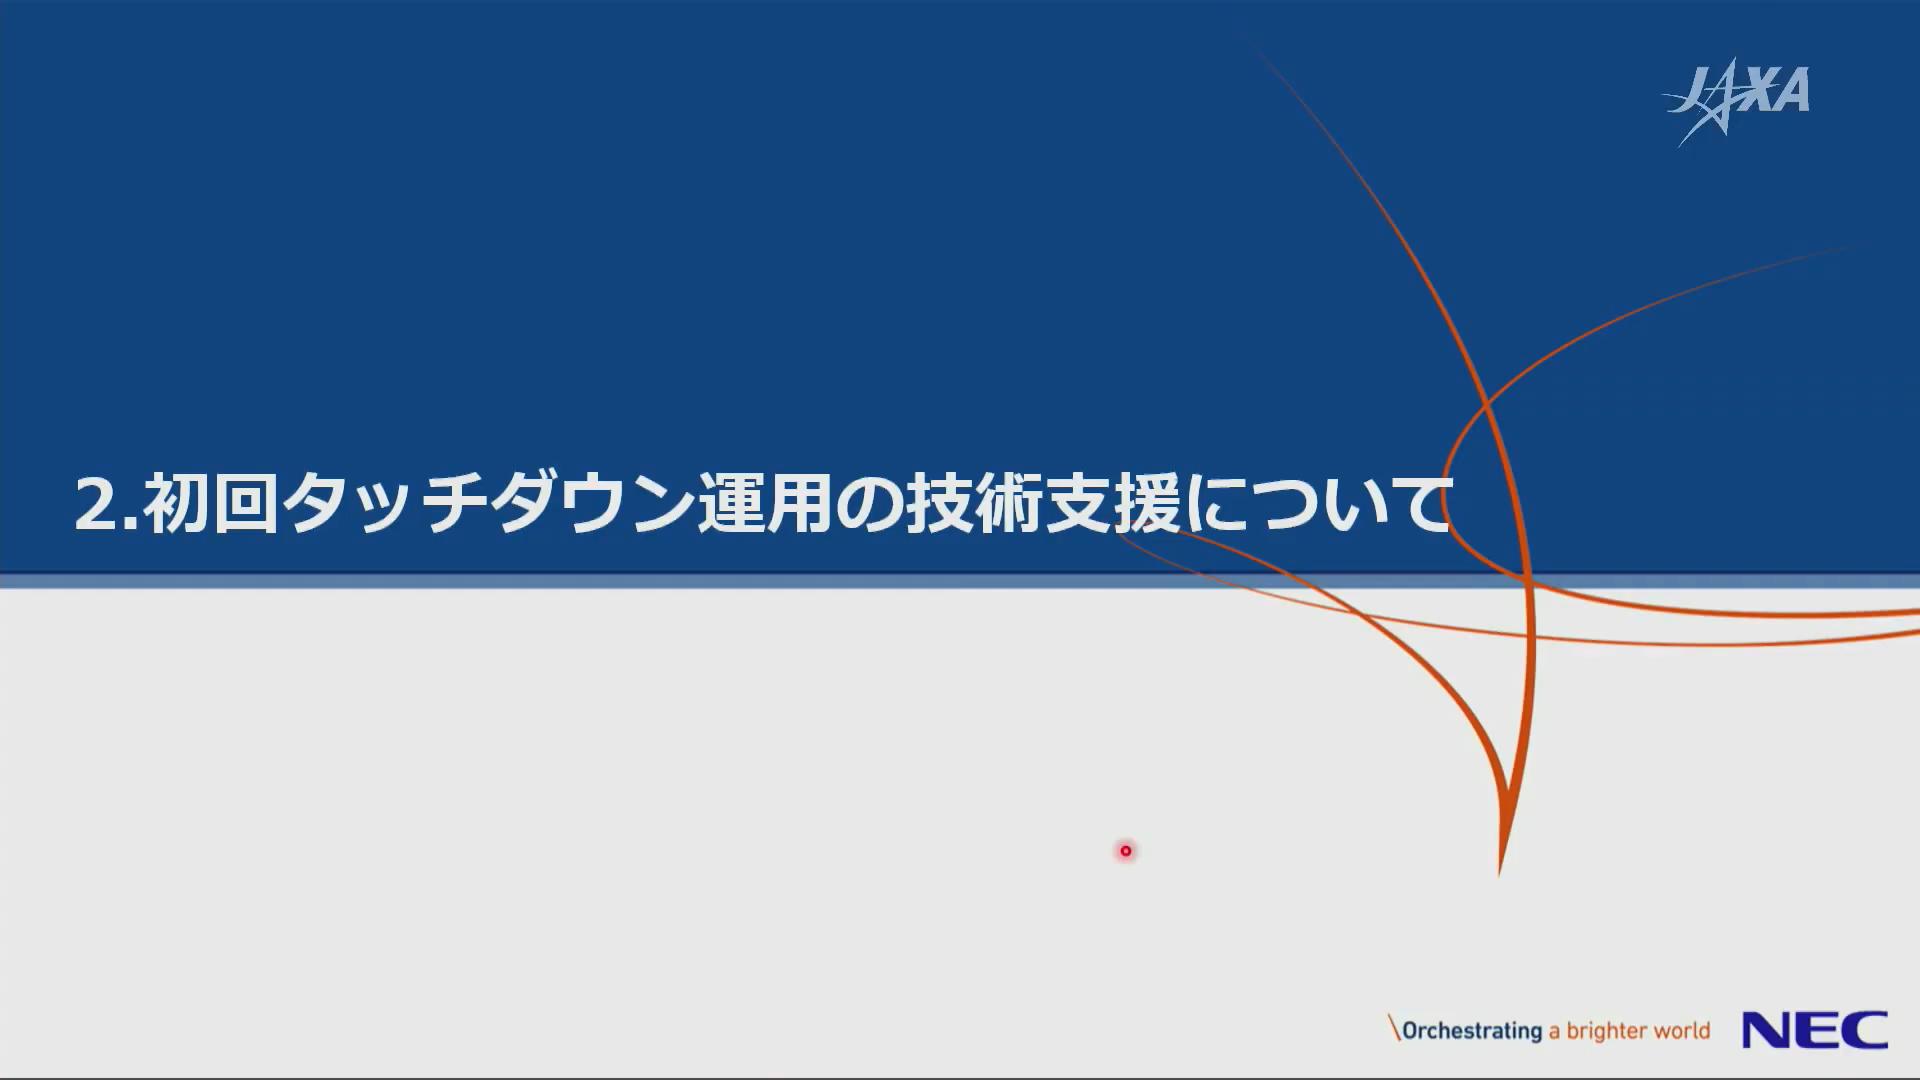 f:id:Imamura:20191219211819p:plain